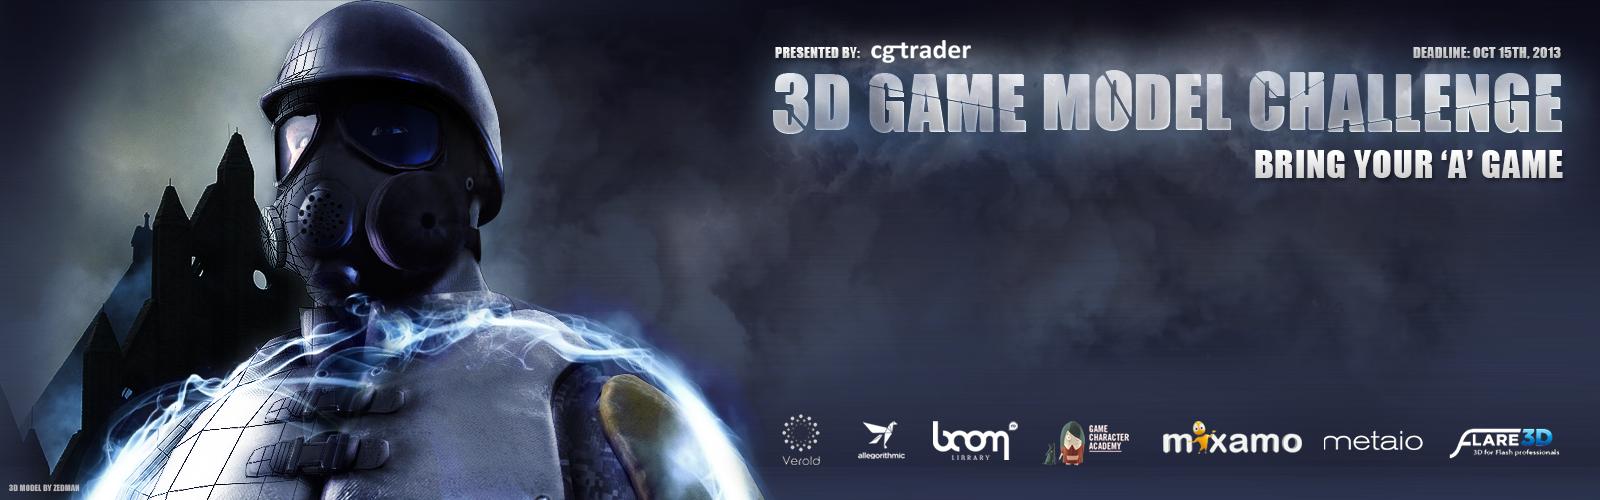 3D Game Model Challenge